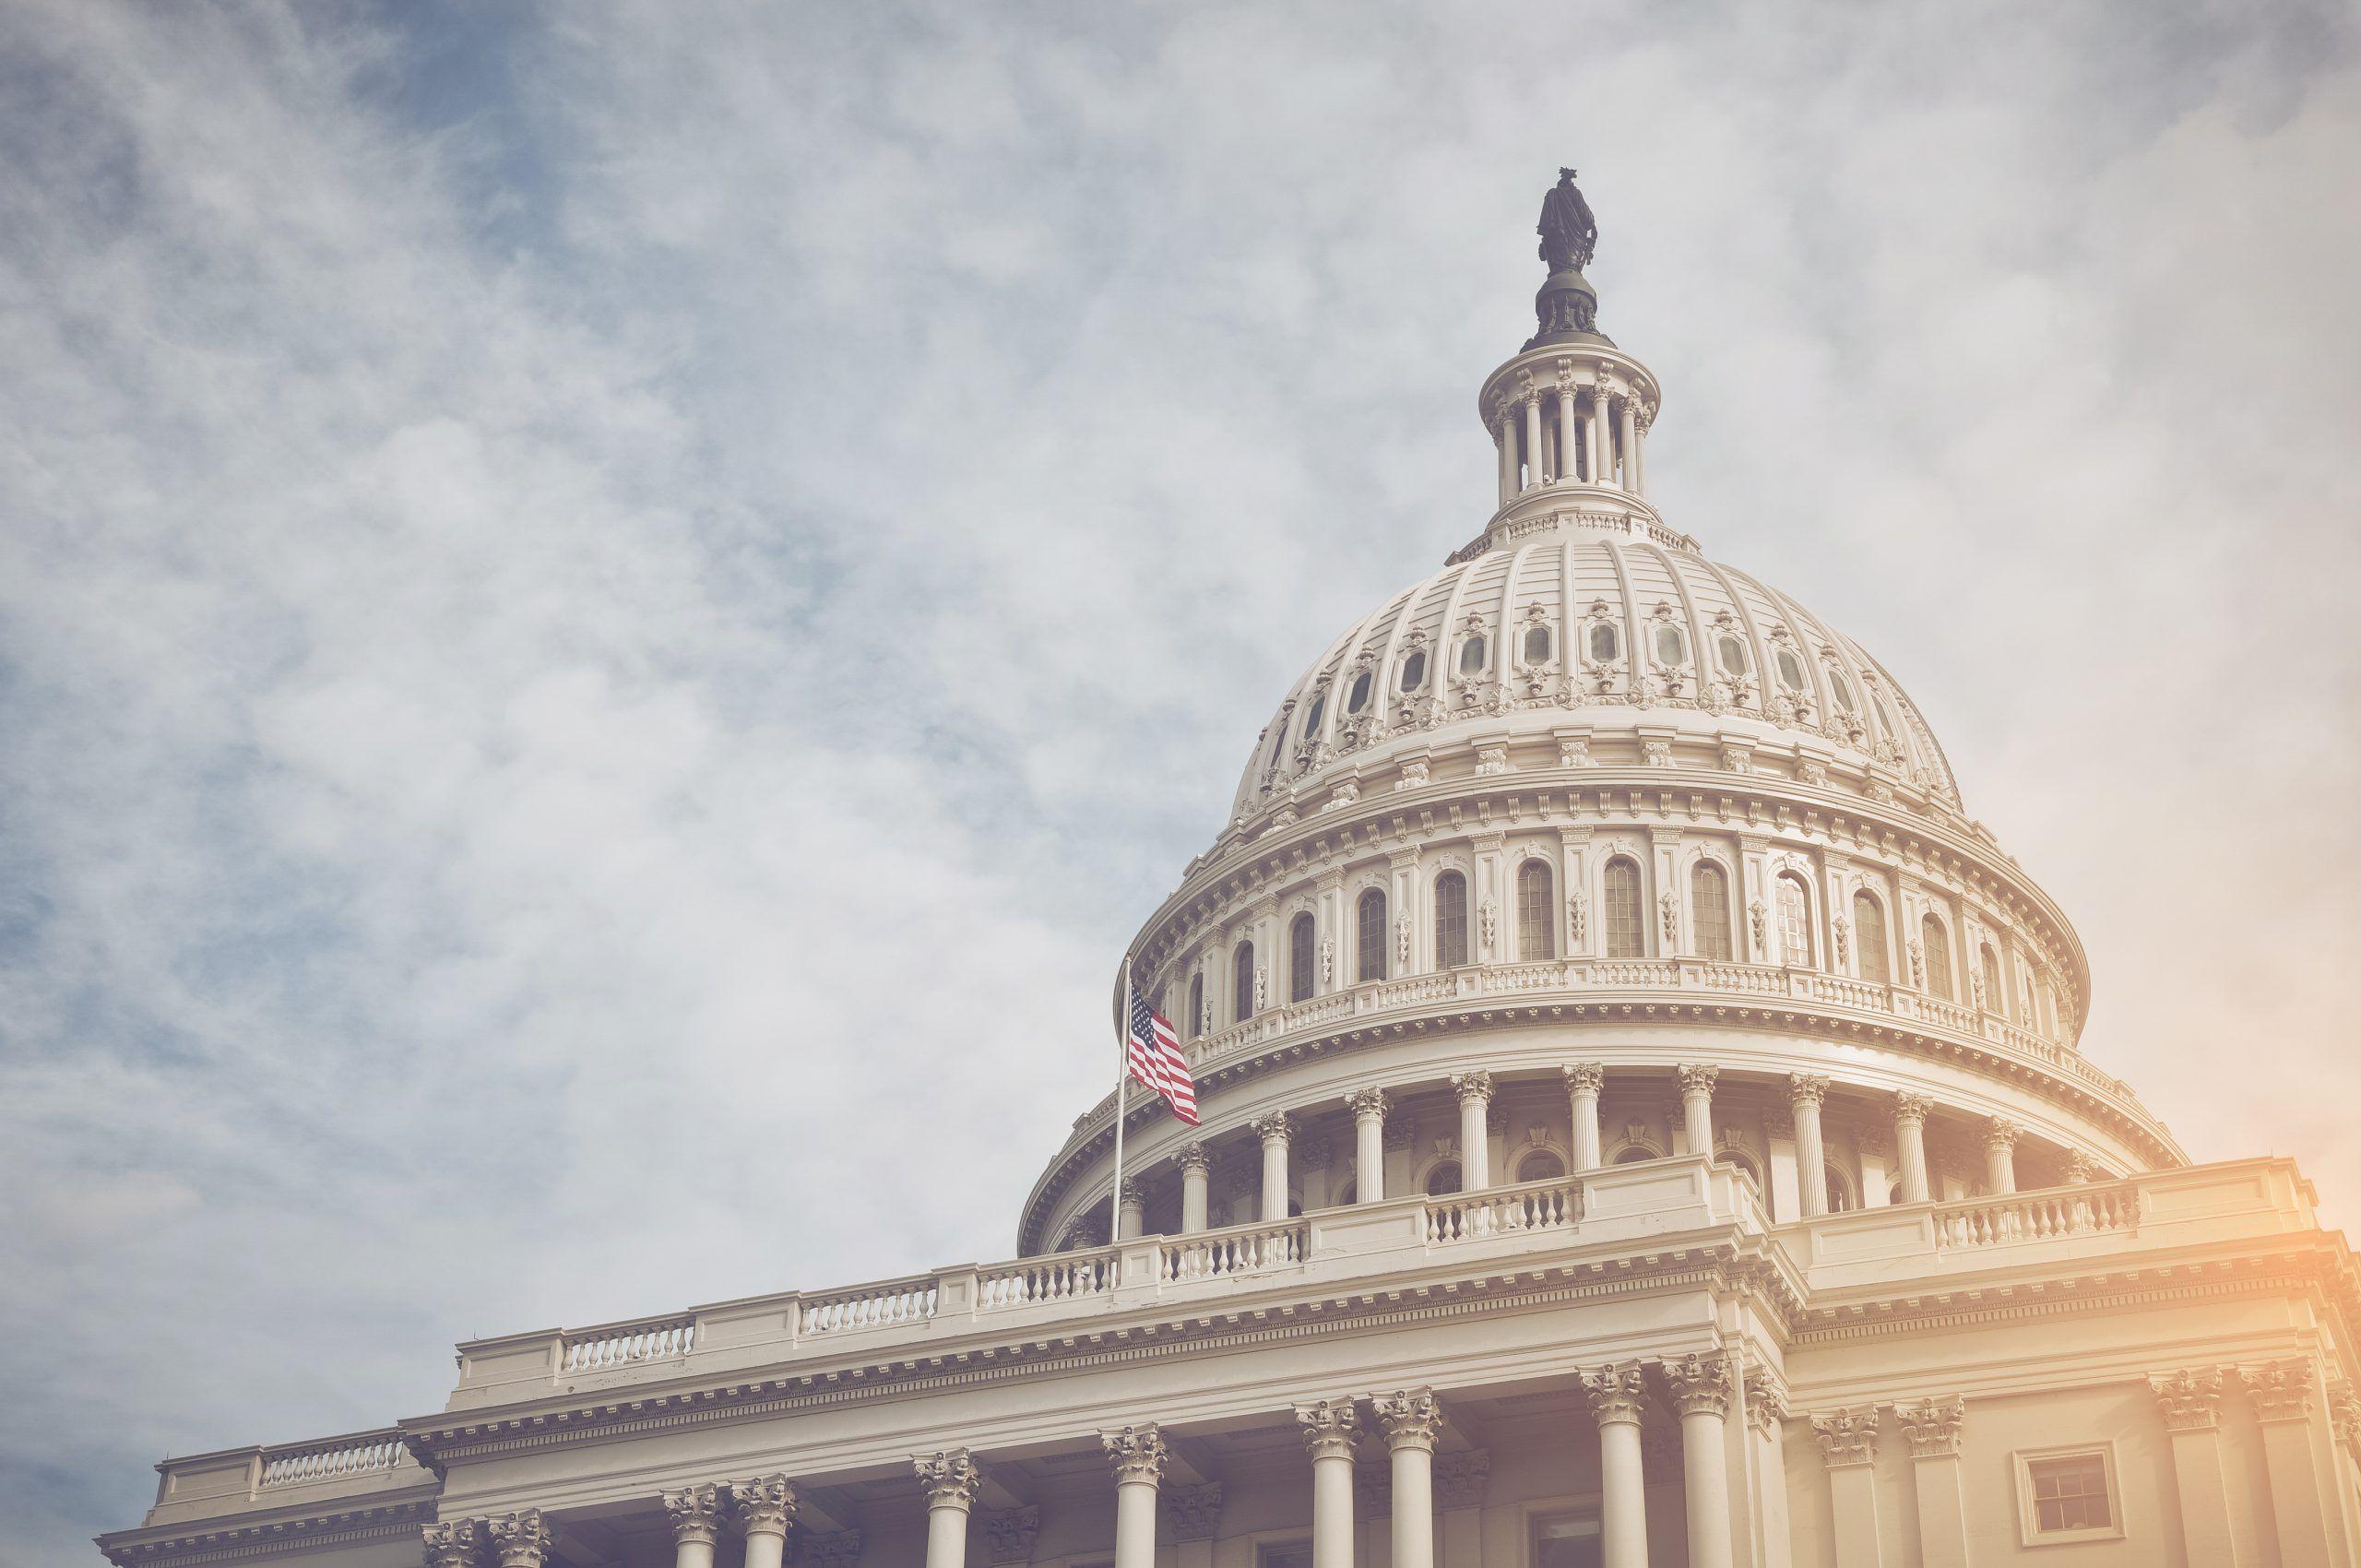 As legislators work toward law requiring companies to alert feds to breaches, key hurdles emerge